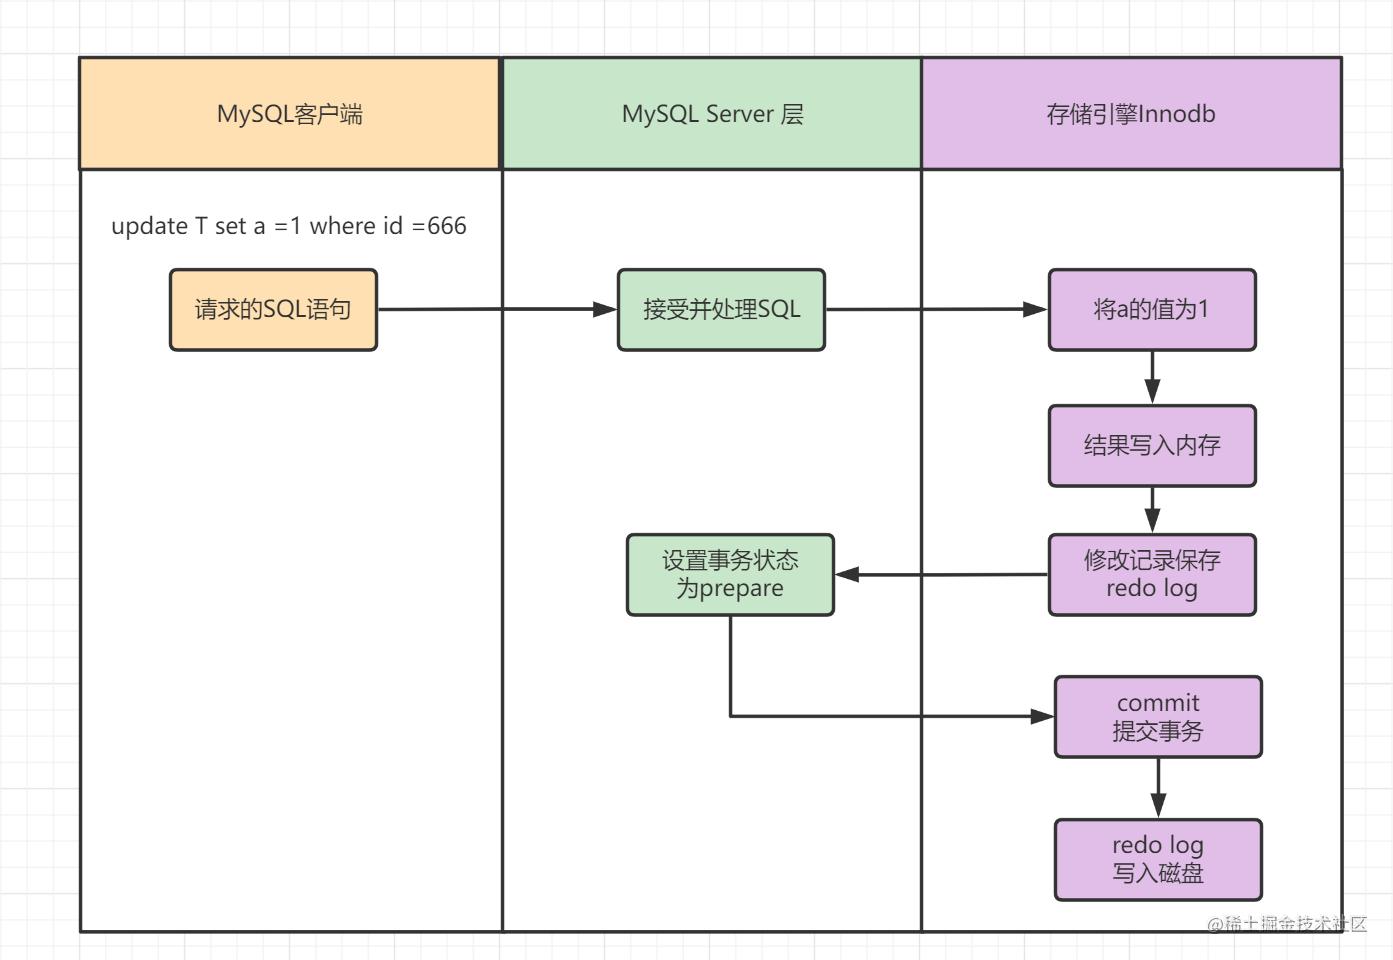 Redo log的执行流程